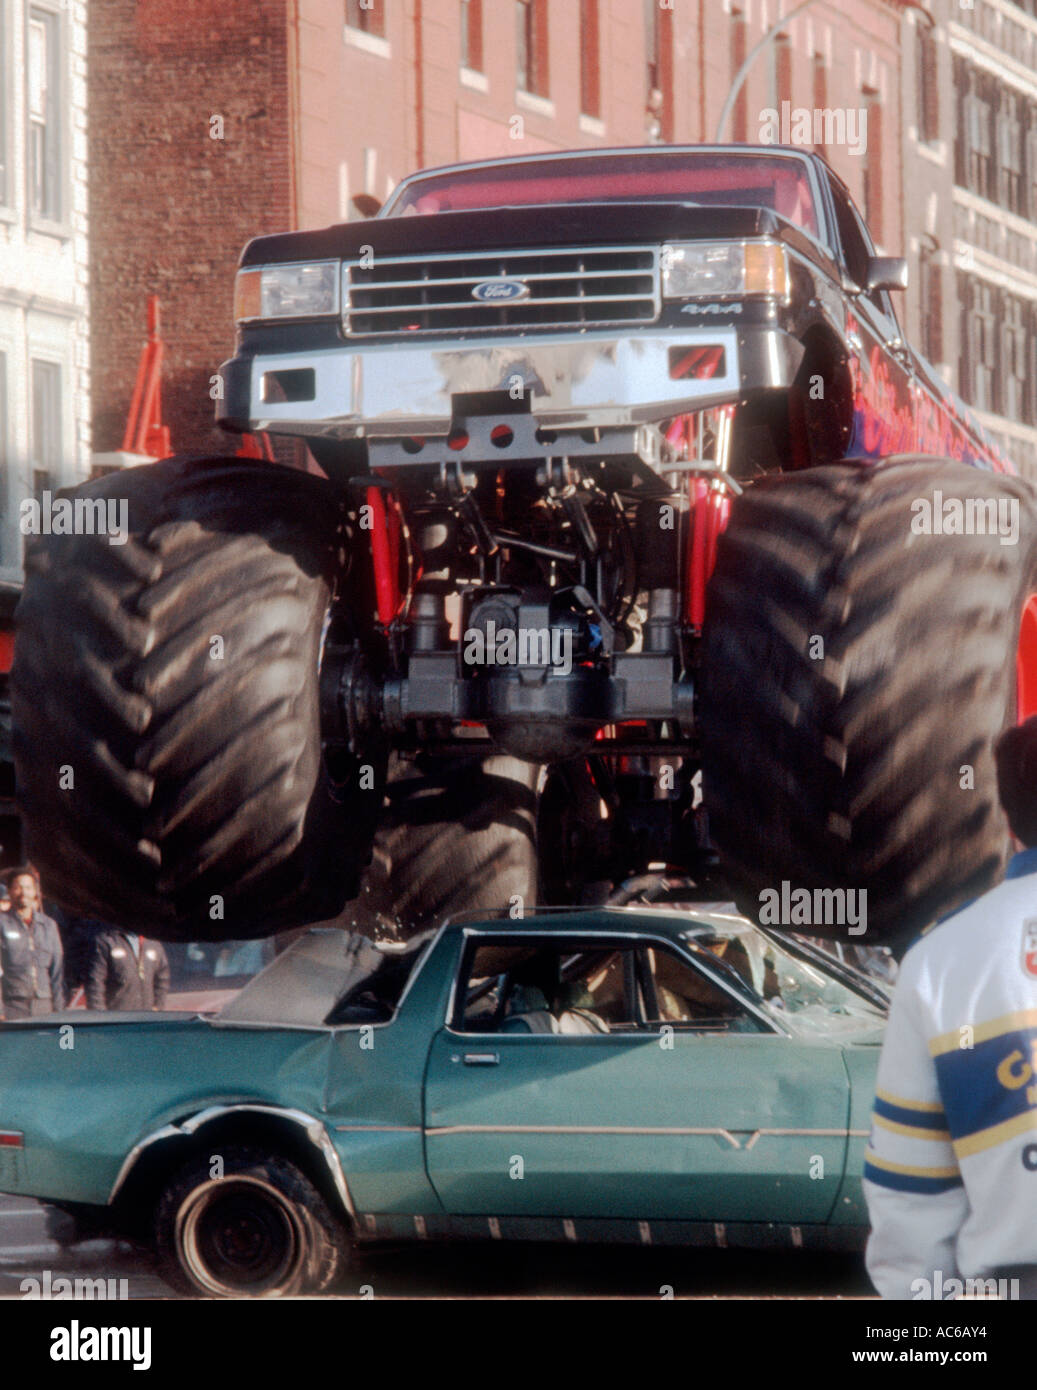 Demonstration Of Monster Truck Crushing Car Stock Photo Royalty